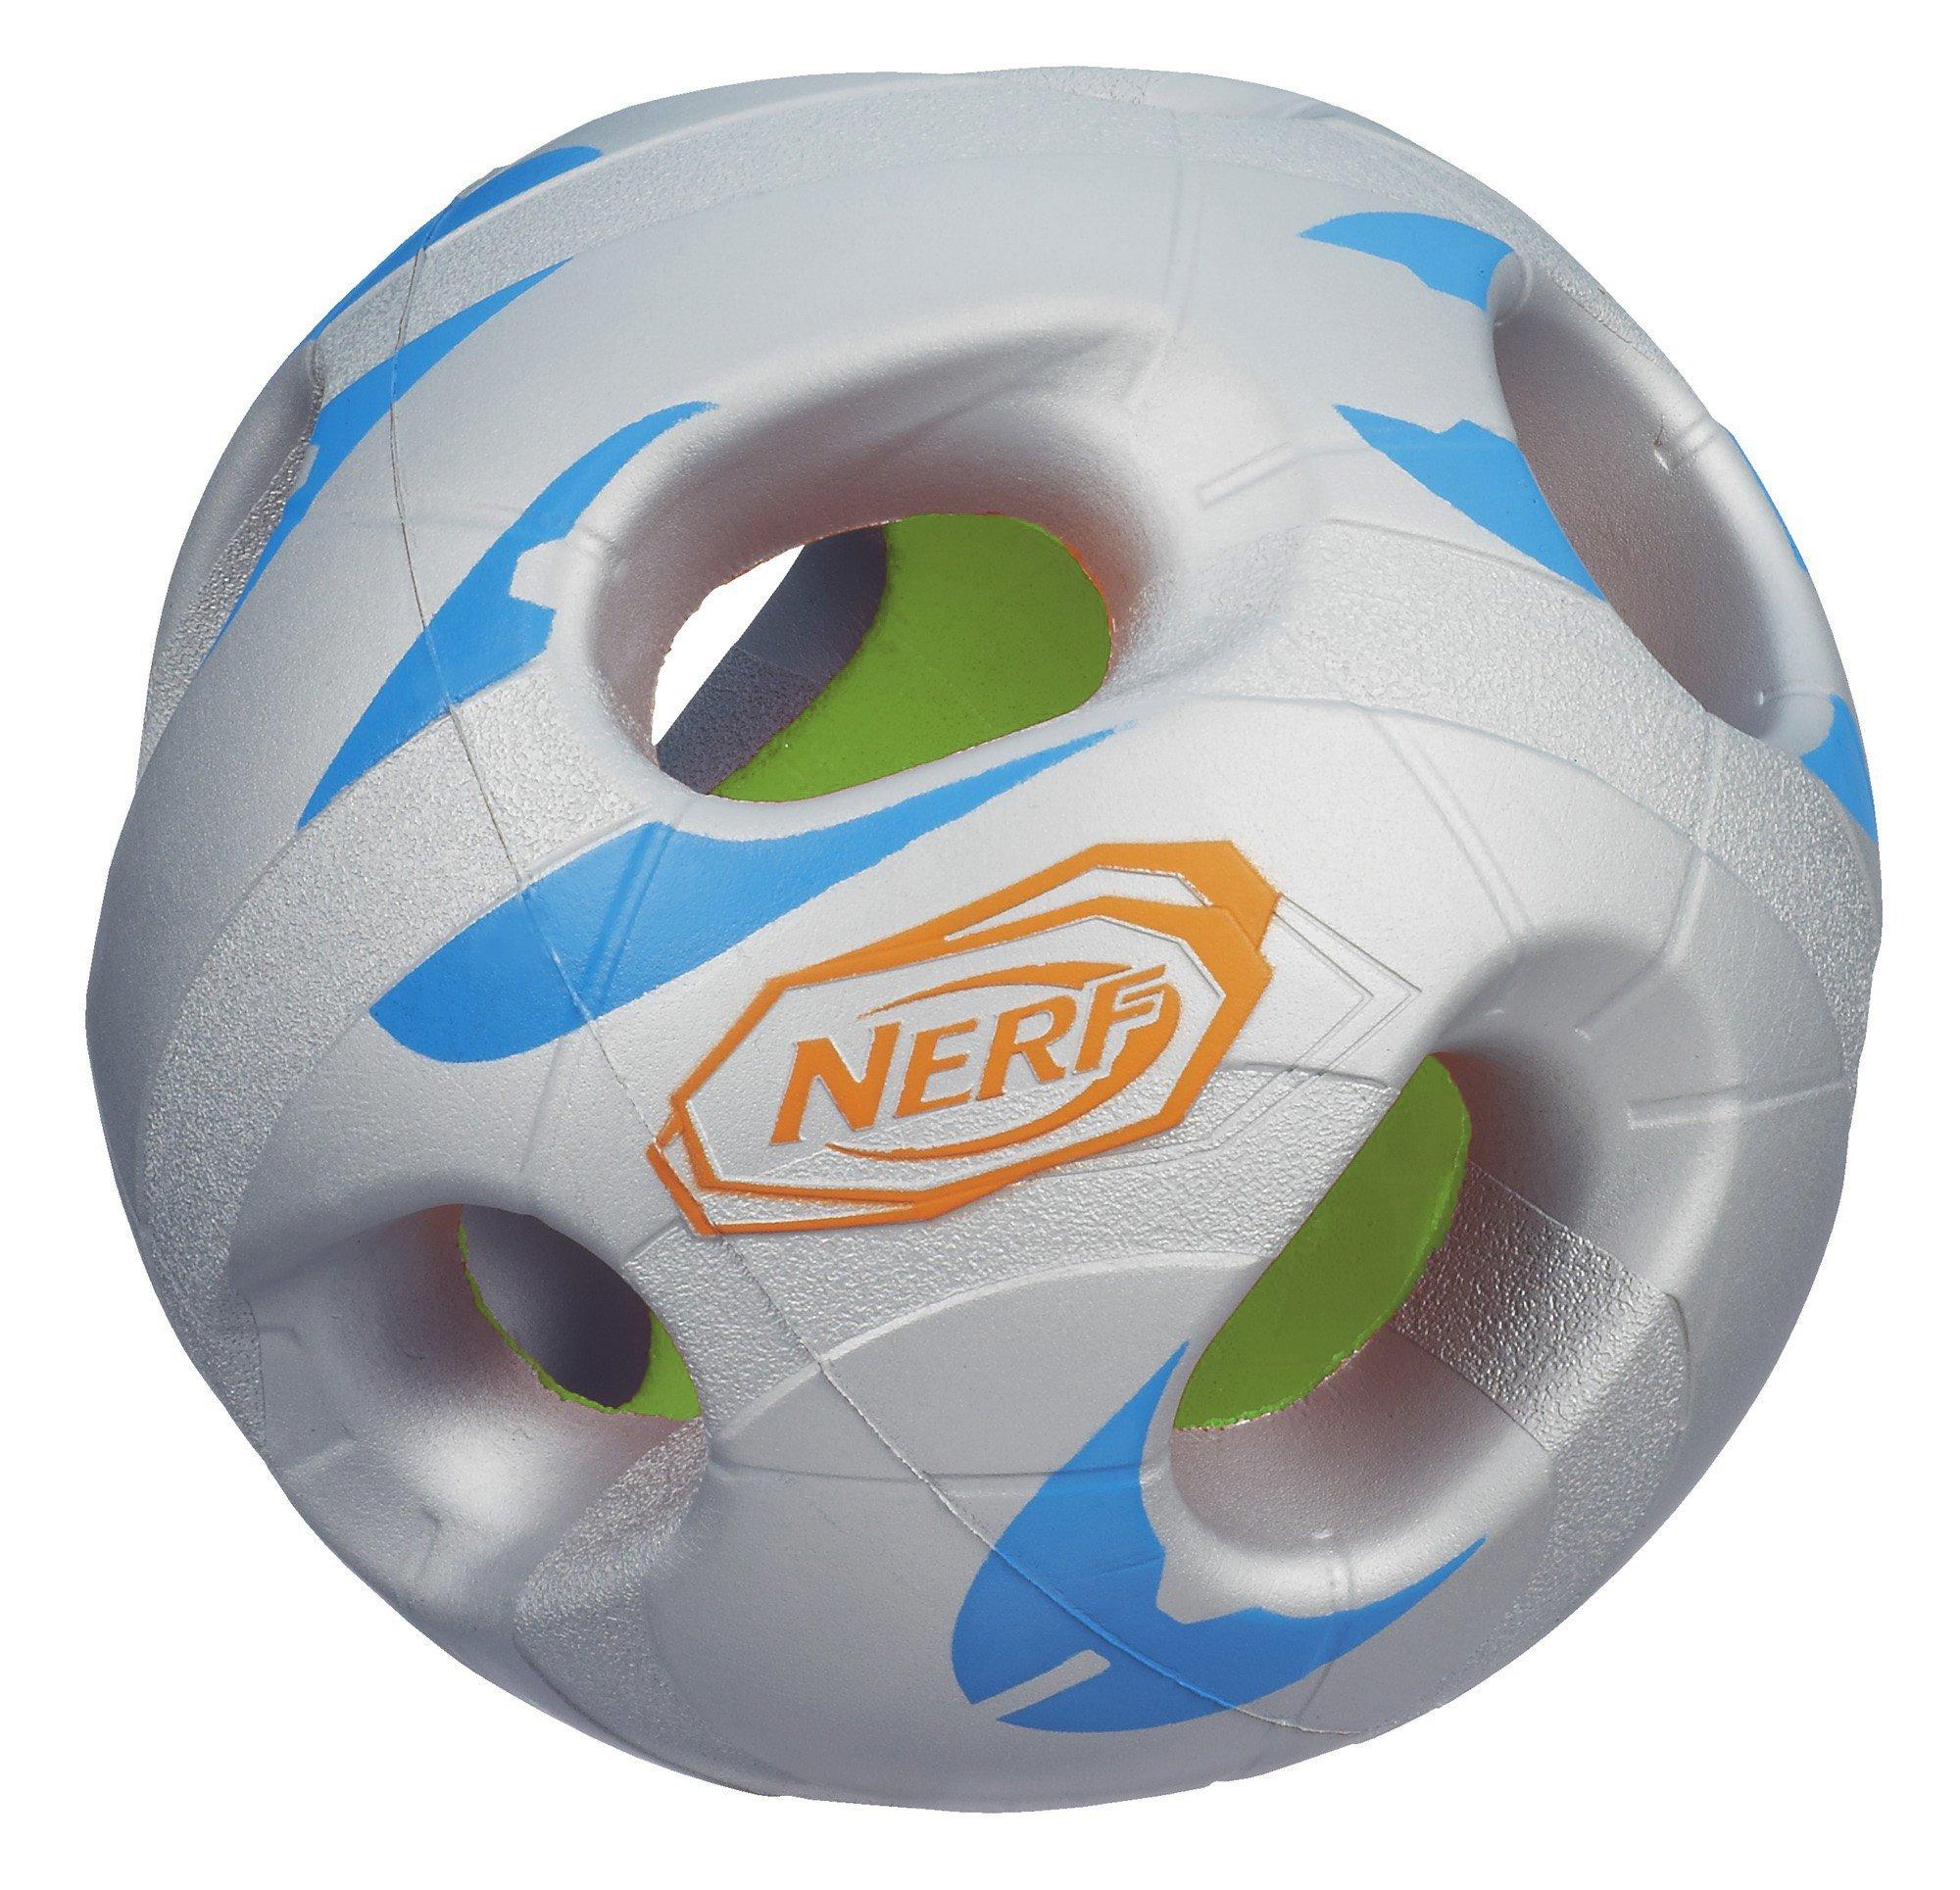 Nerf Sports Bash Ball, Silver